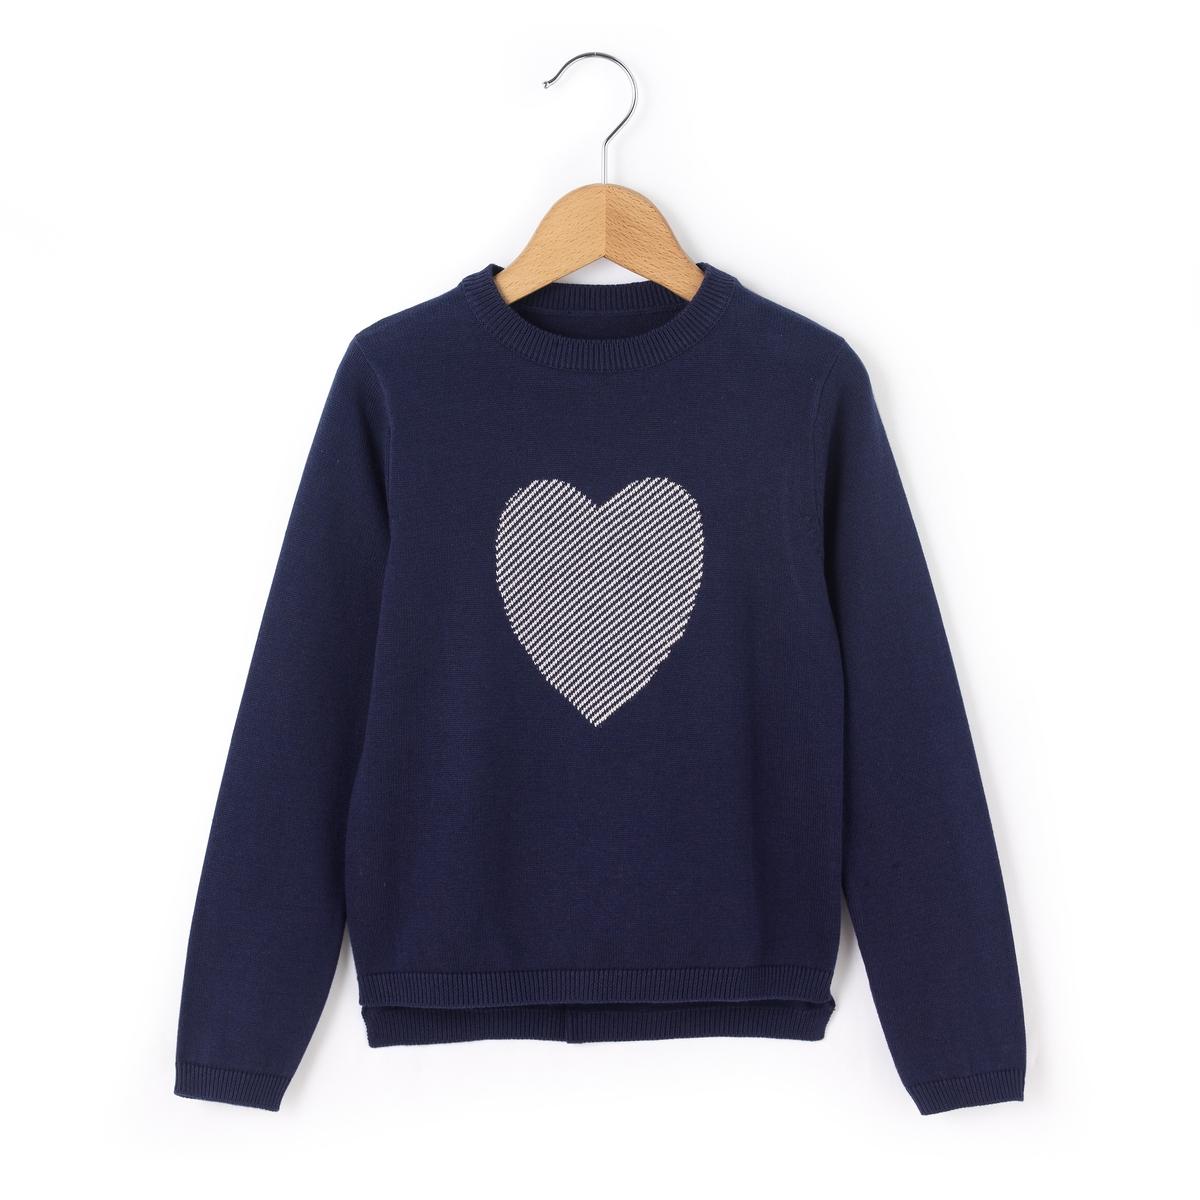 Пуловер с рисунком сердце 3-12 лет